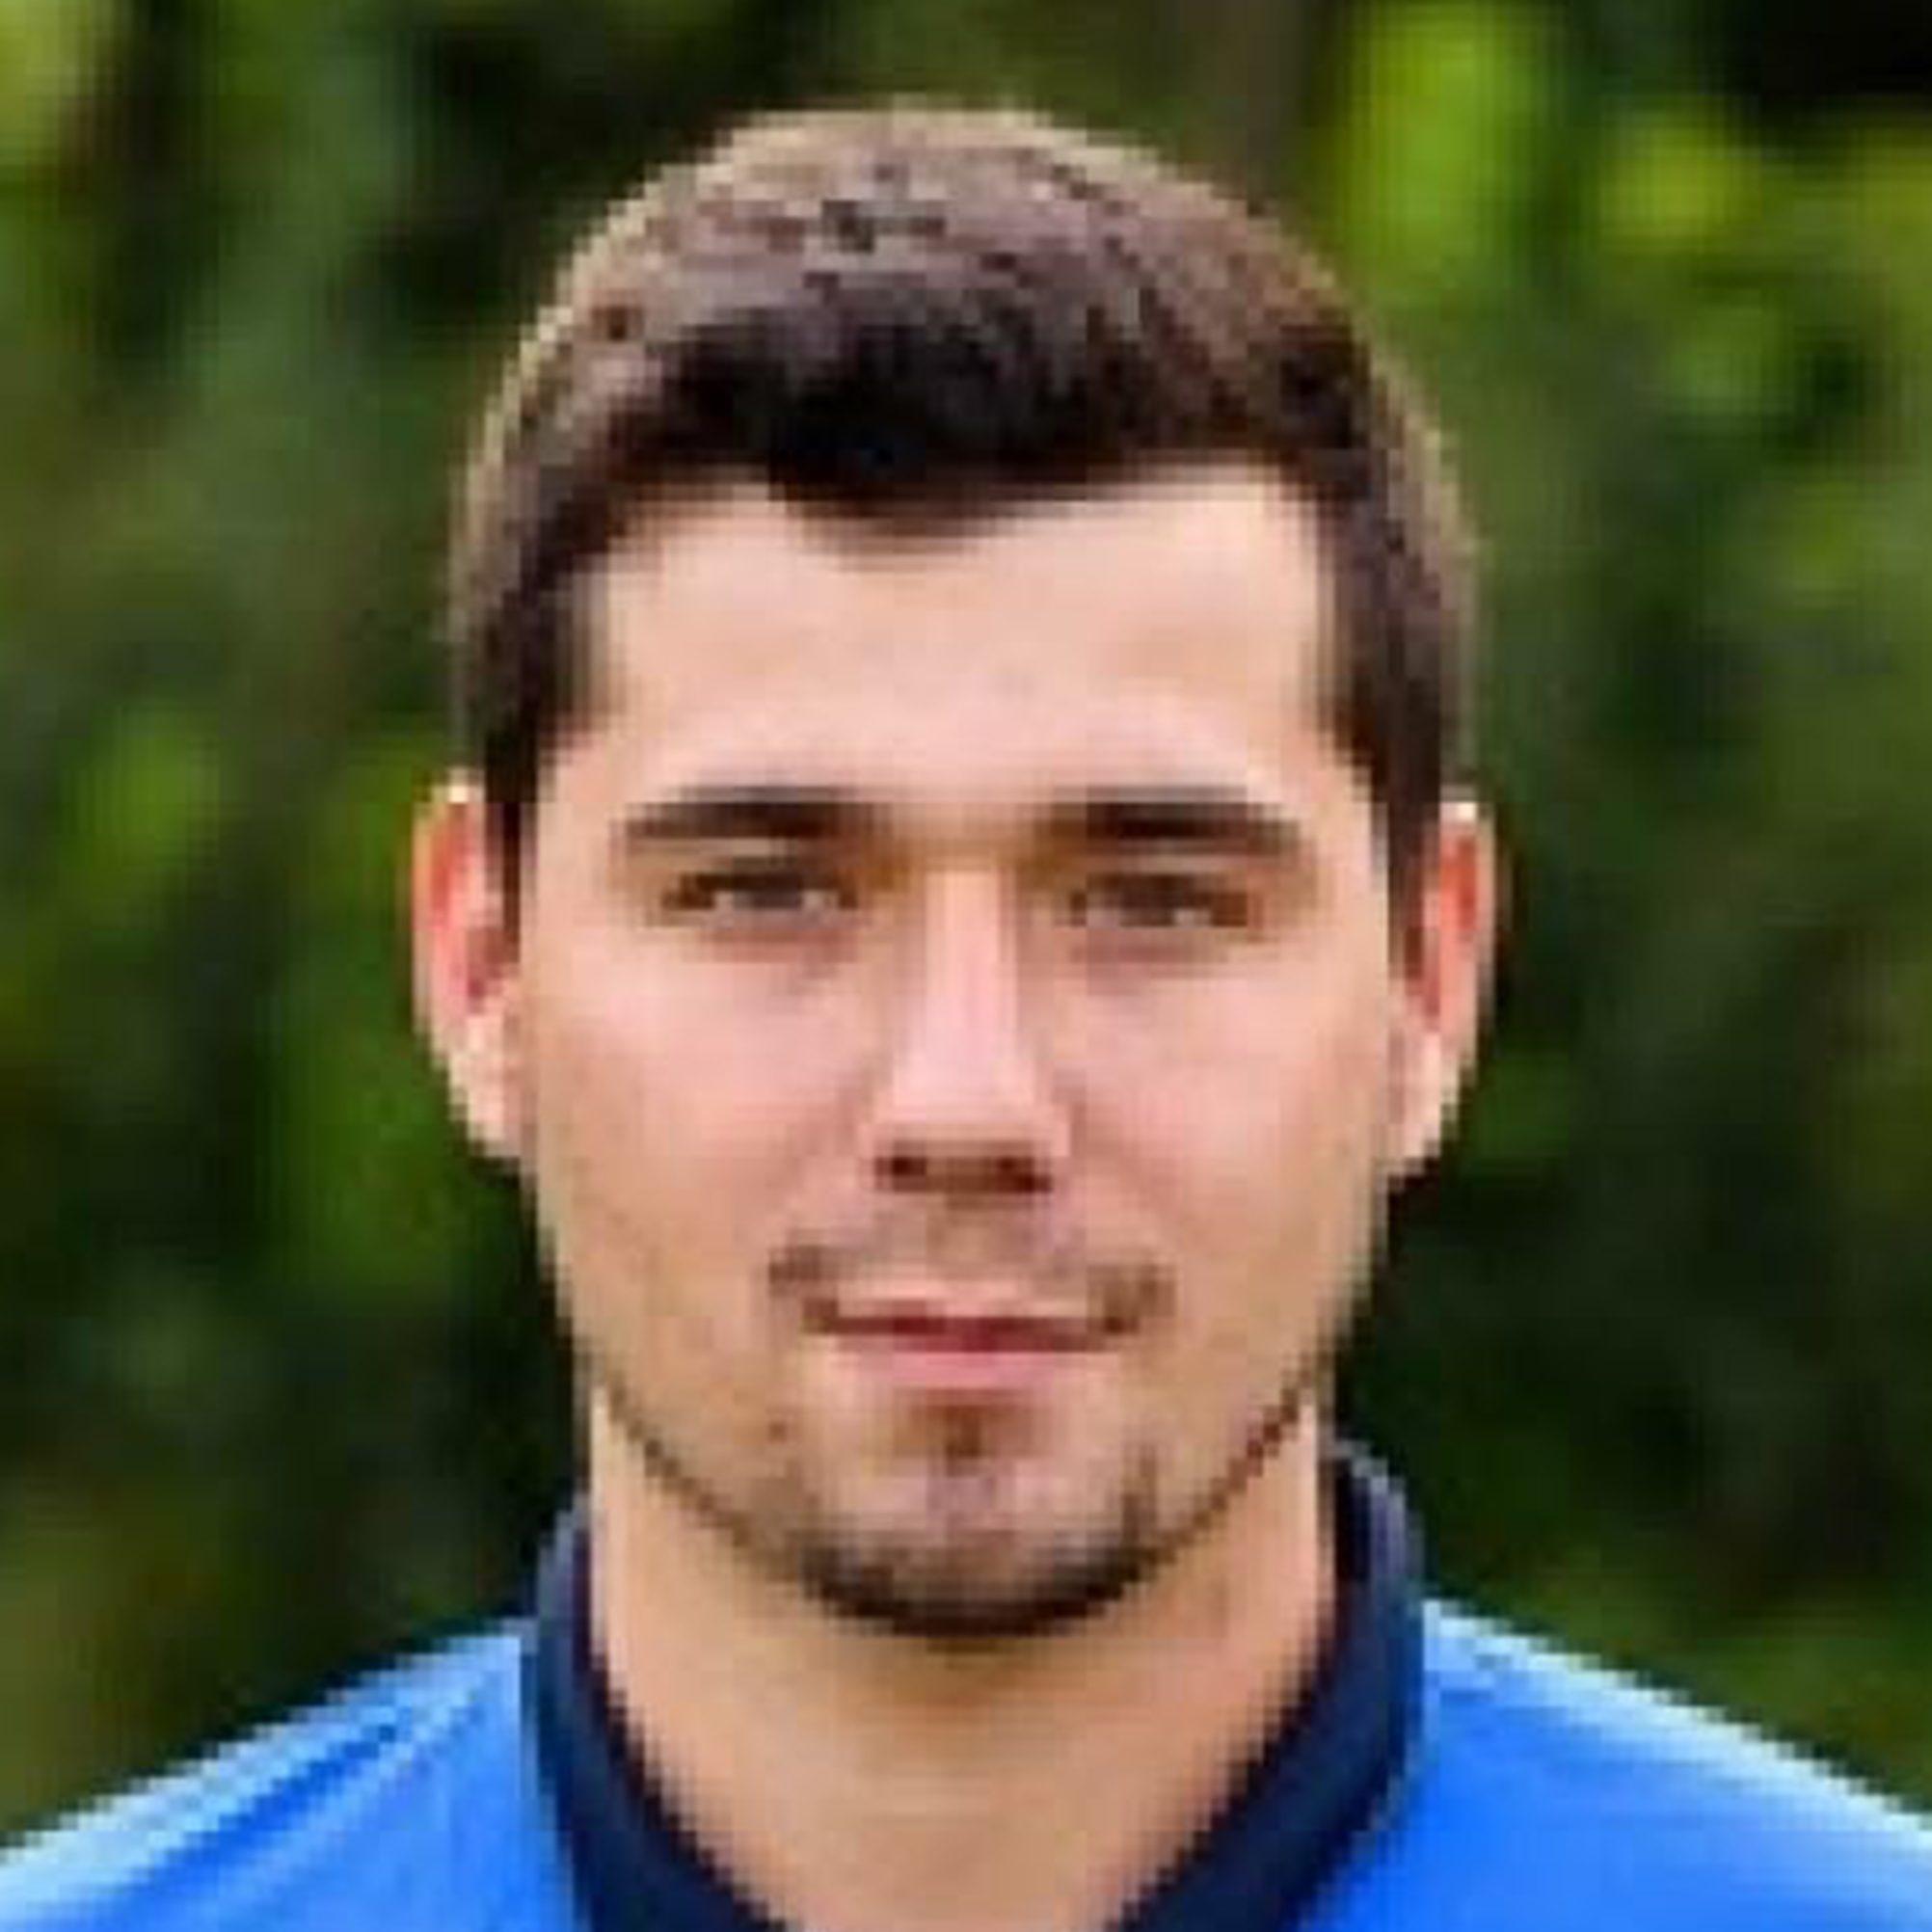 Vlatko Stjepanovic - napadac